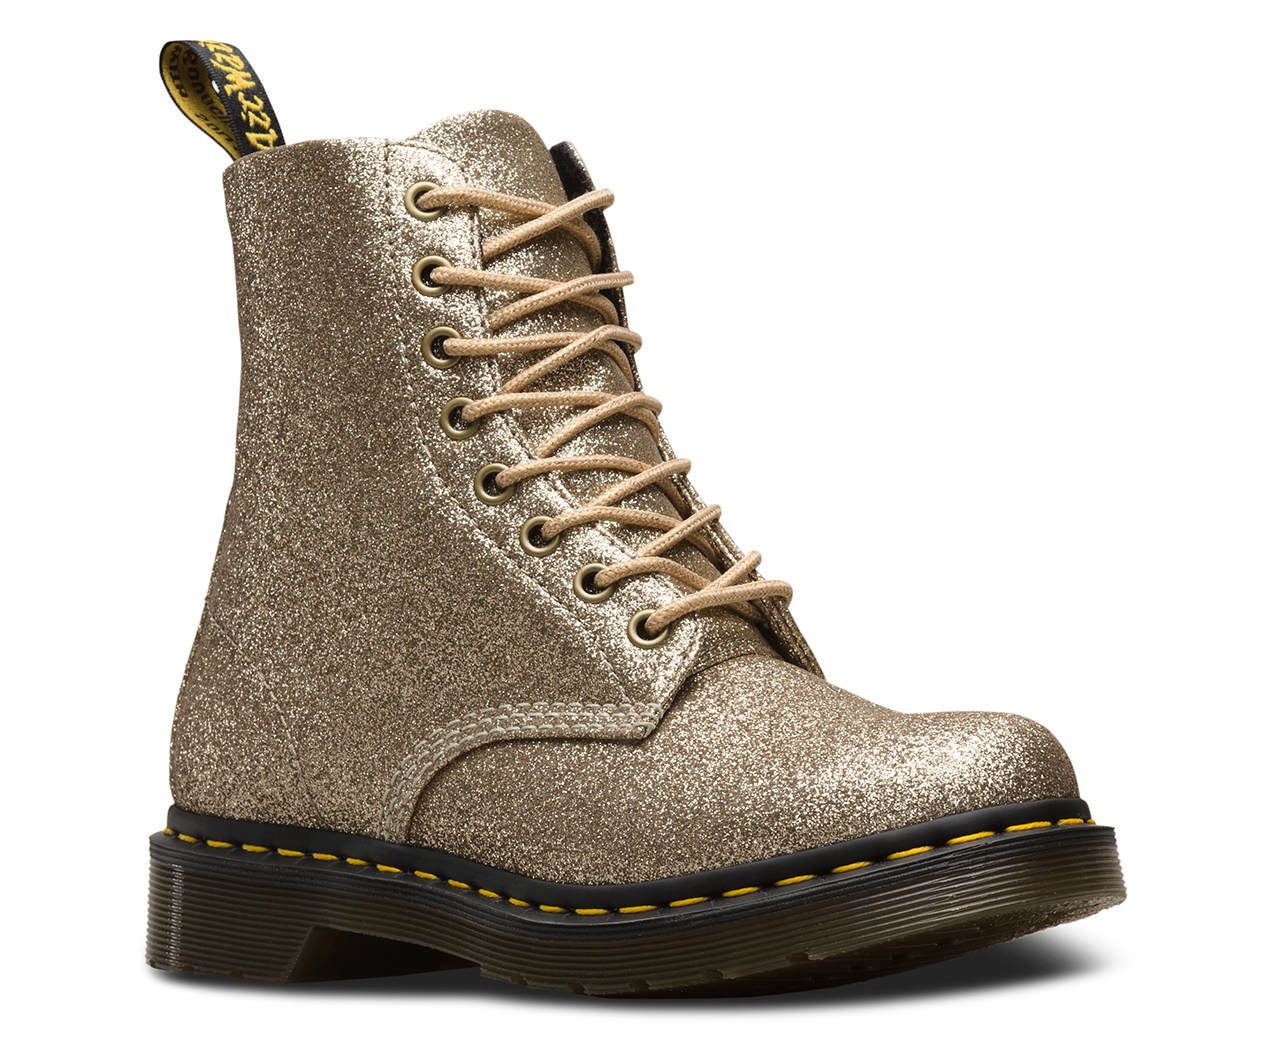 93e6803de559 1460 PASCAL FINE GLITTER | Women's Boots | Dr. Martens Official